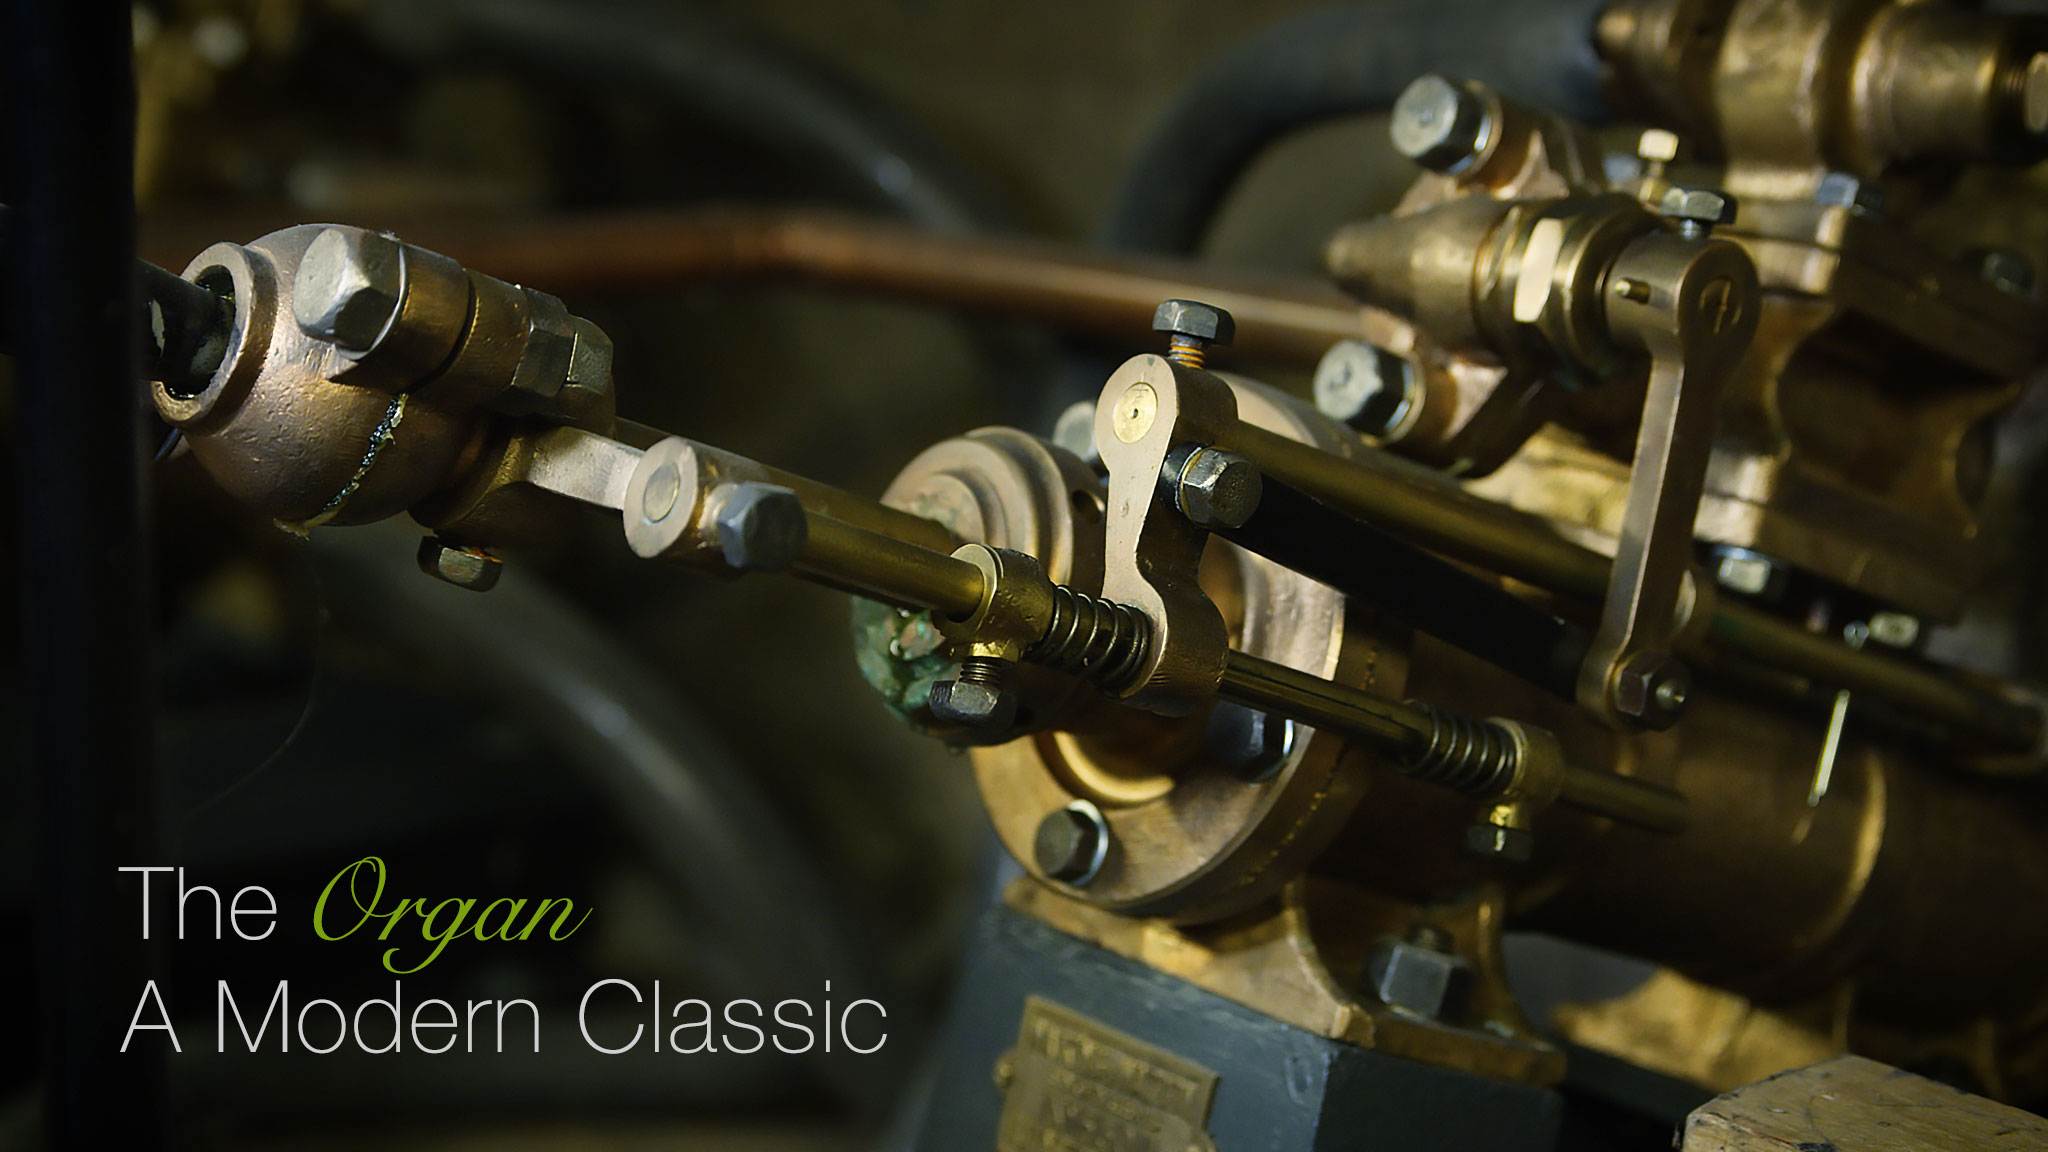 The Organ a modern classic documentary by cone magazine